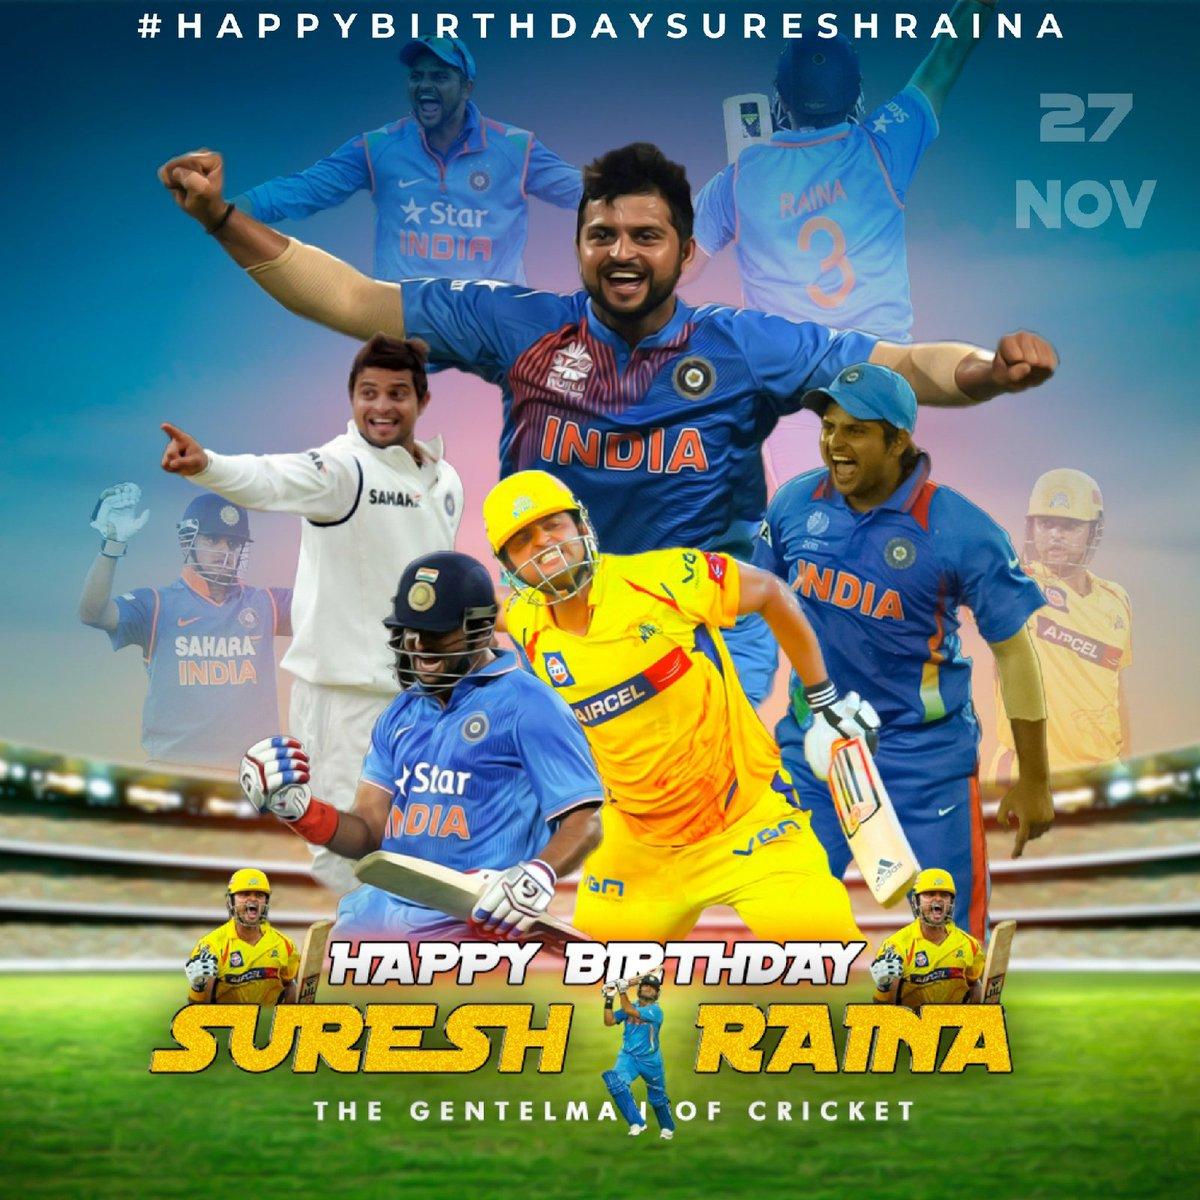 Wishing u a many many returns  of day my fav @ImRaina sir🎂🤗🥳🎉 #SureshRaina #HappyBirthdayRaina